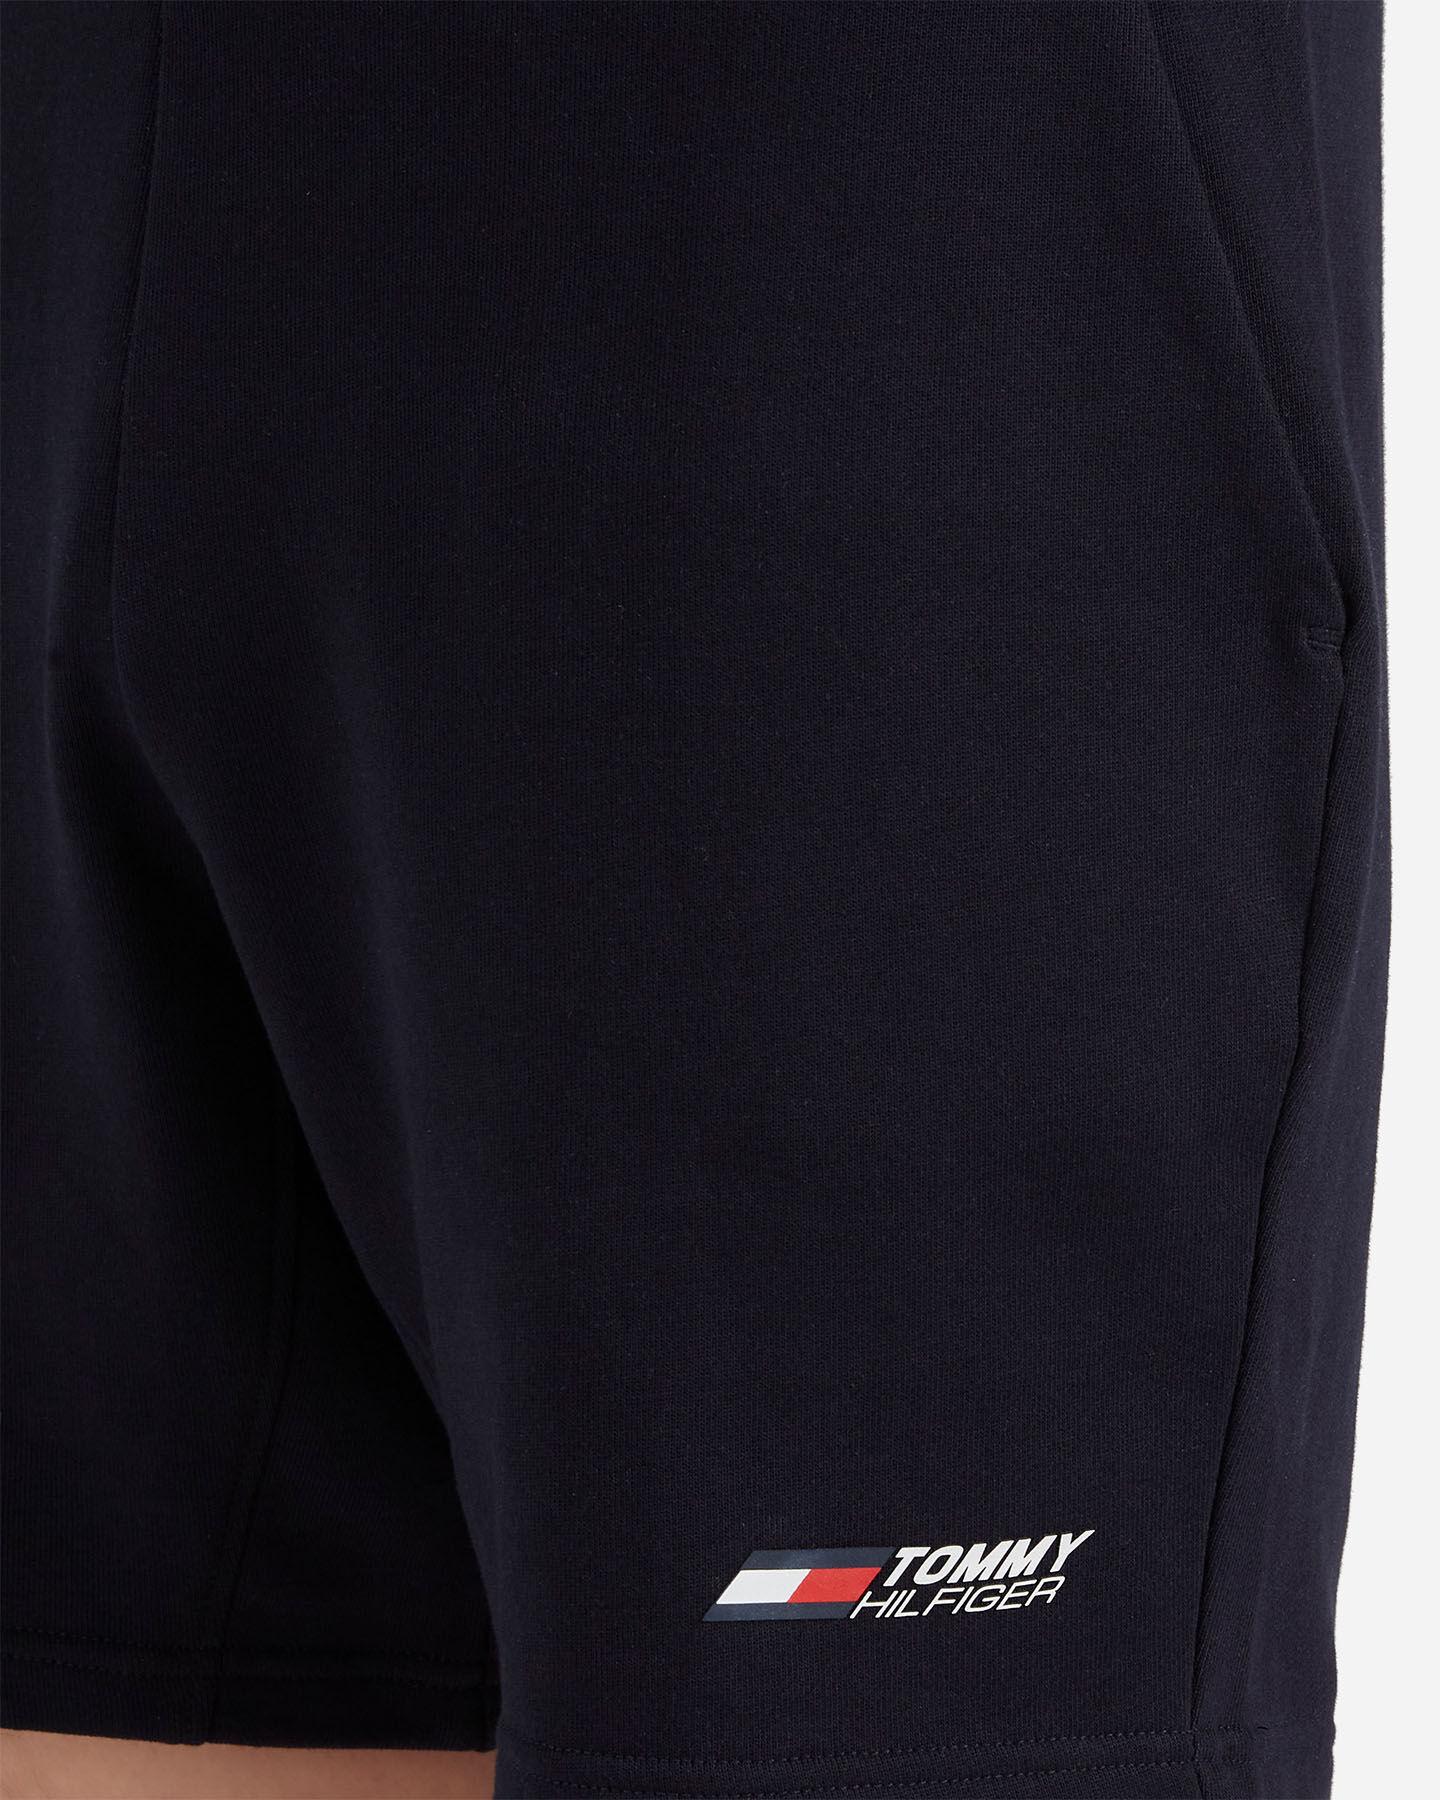 Pantaloncini TOMMY HILFIGER SMALL LOGO M S4089497 scatto 3